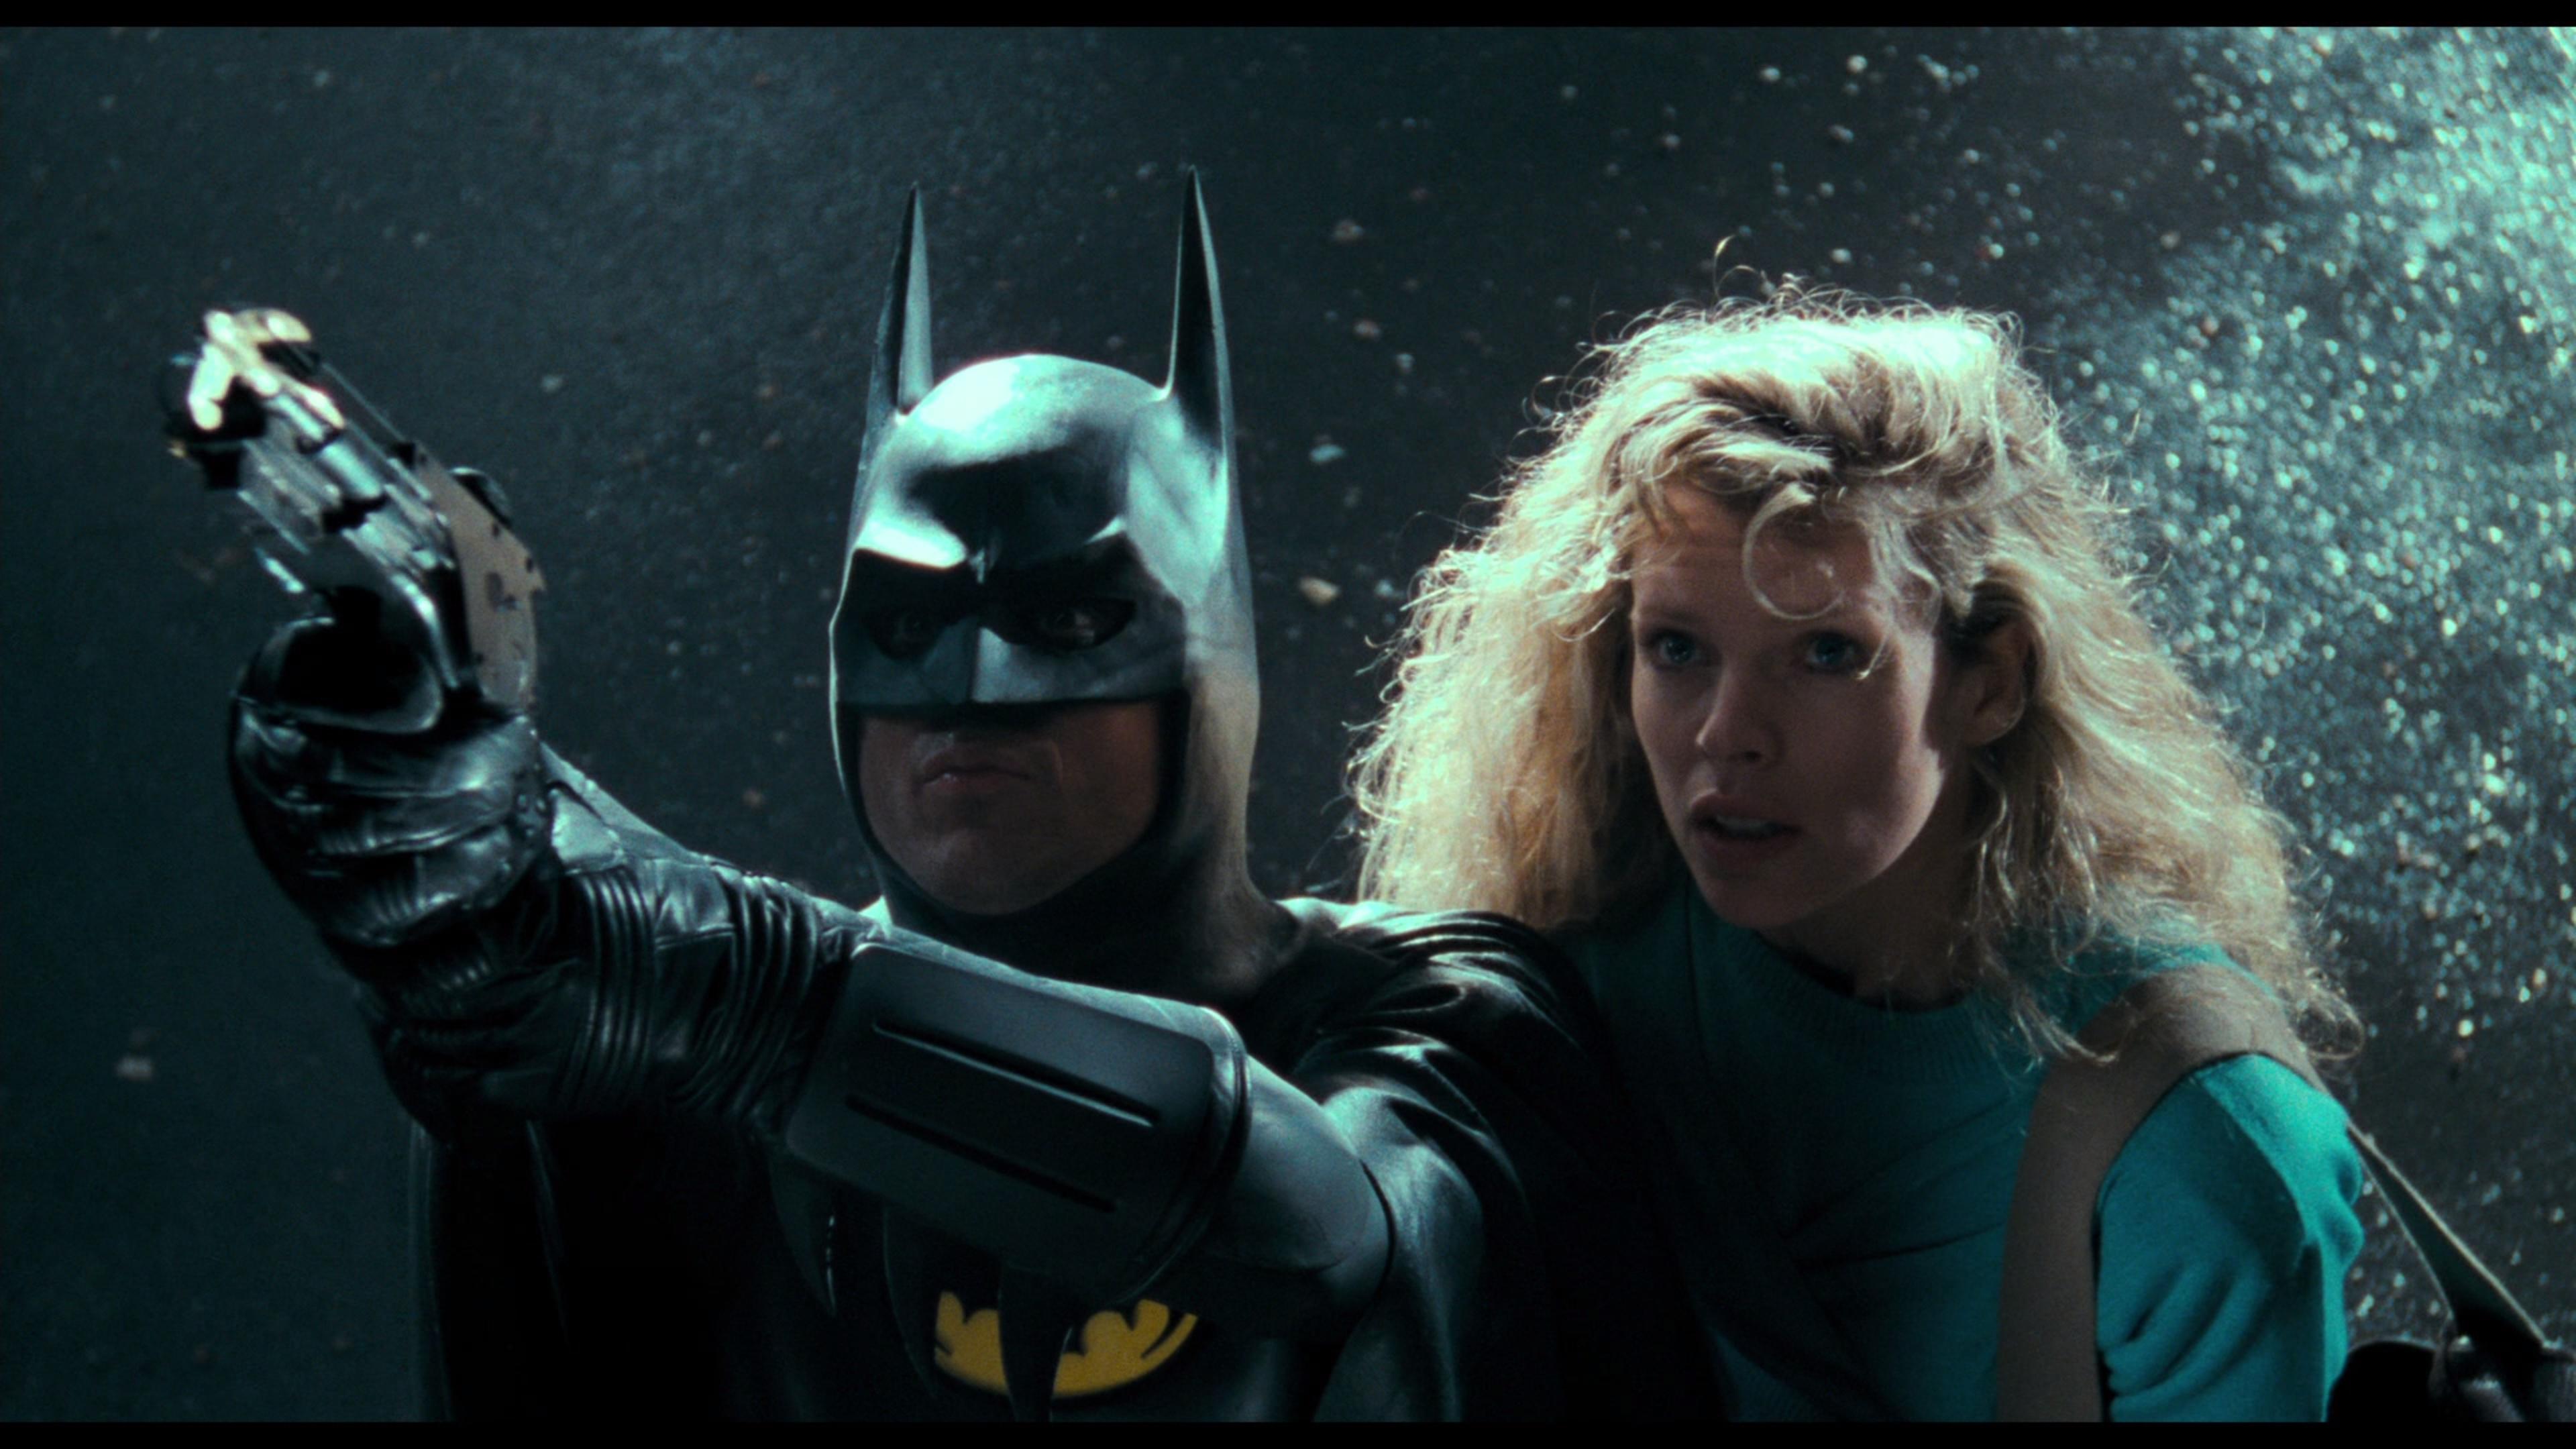 Batman 1989 30th Anniversary Edition 4k Ultra Hd Blu Ray Ultra Hd Review High Def Digest